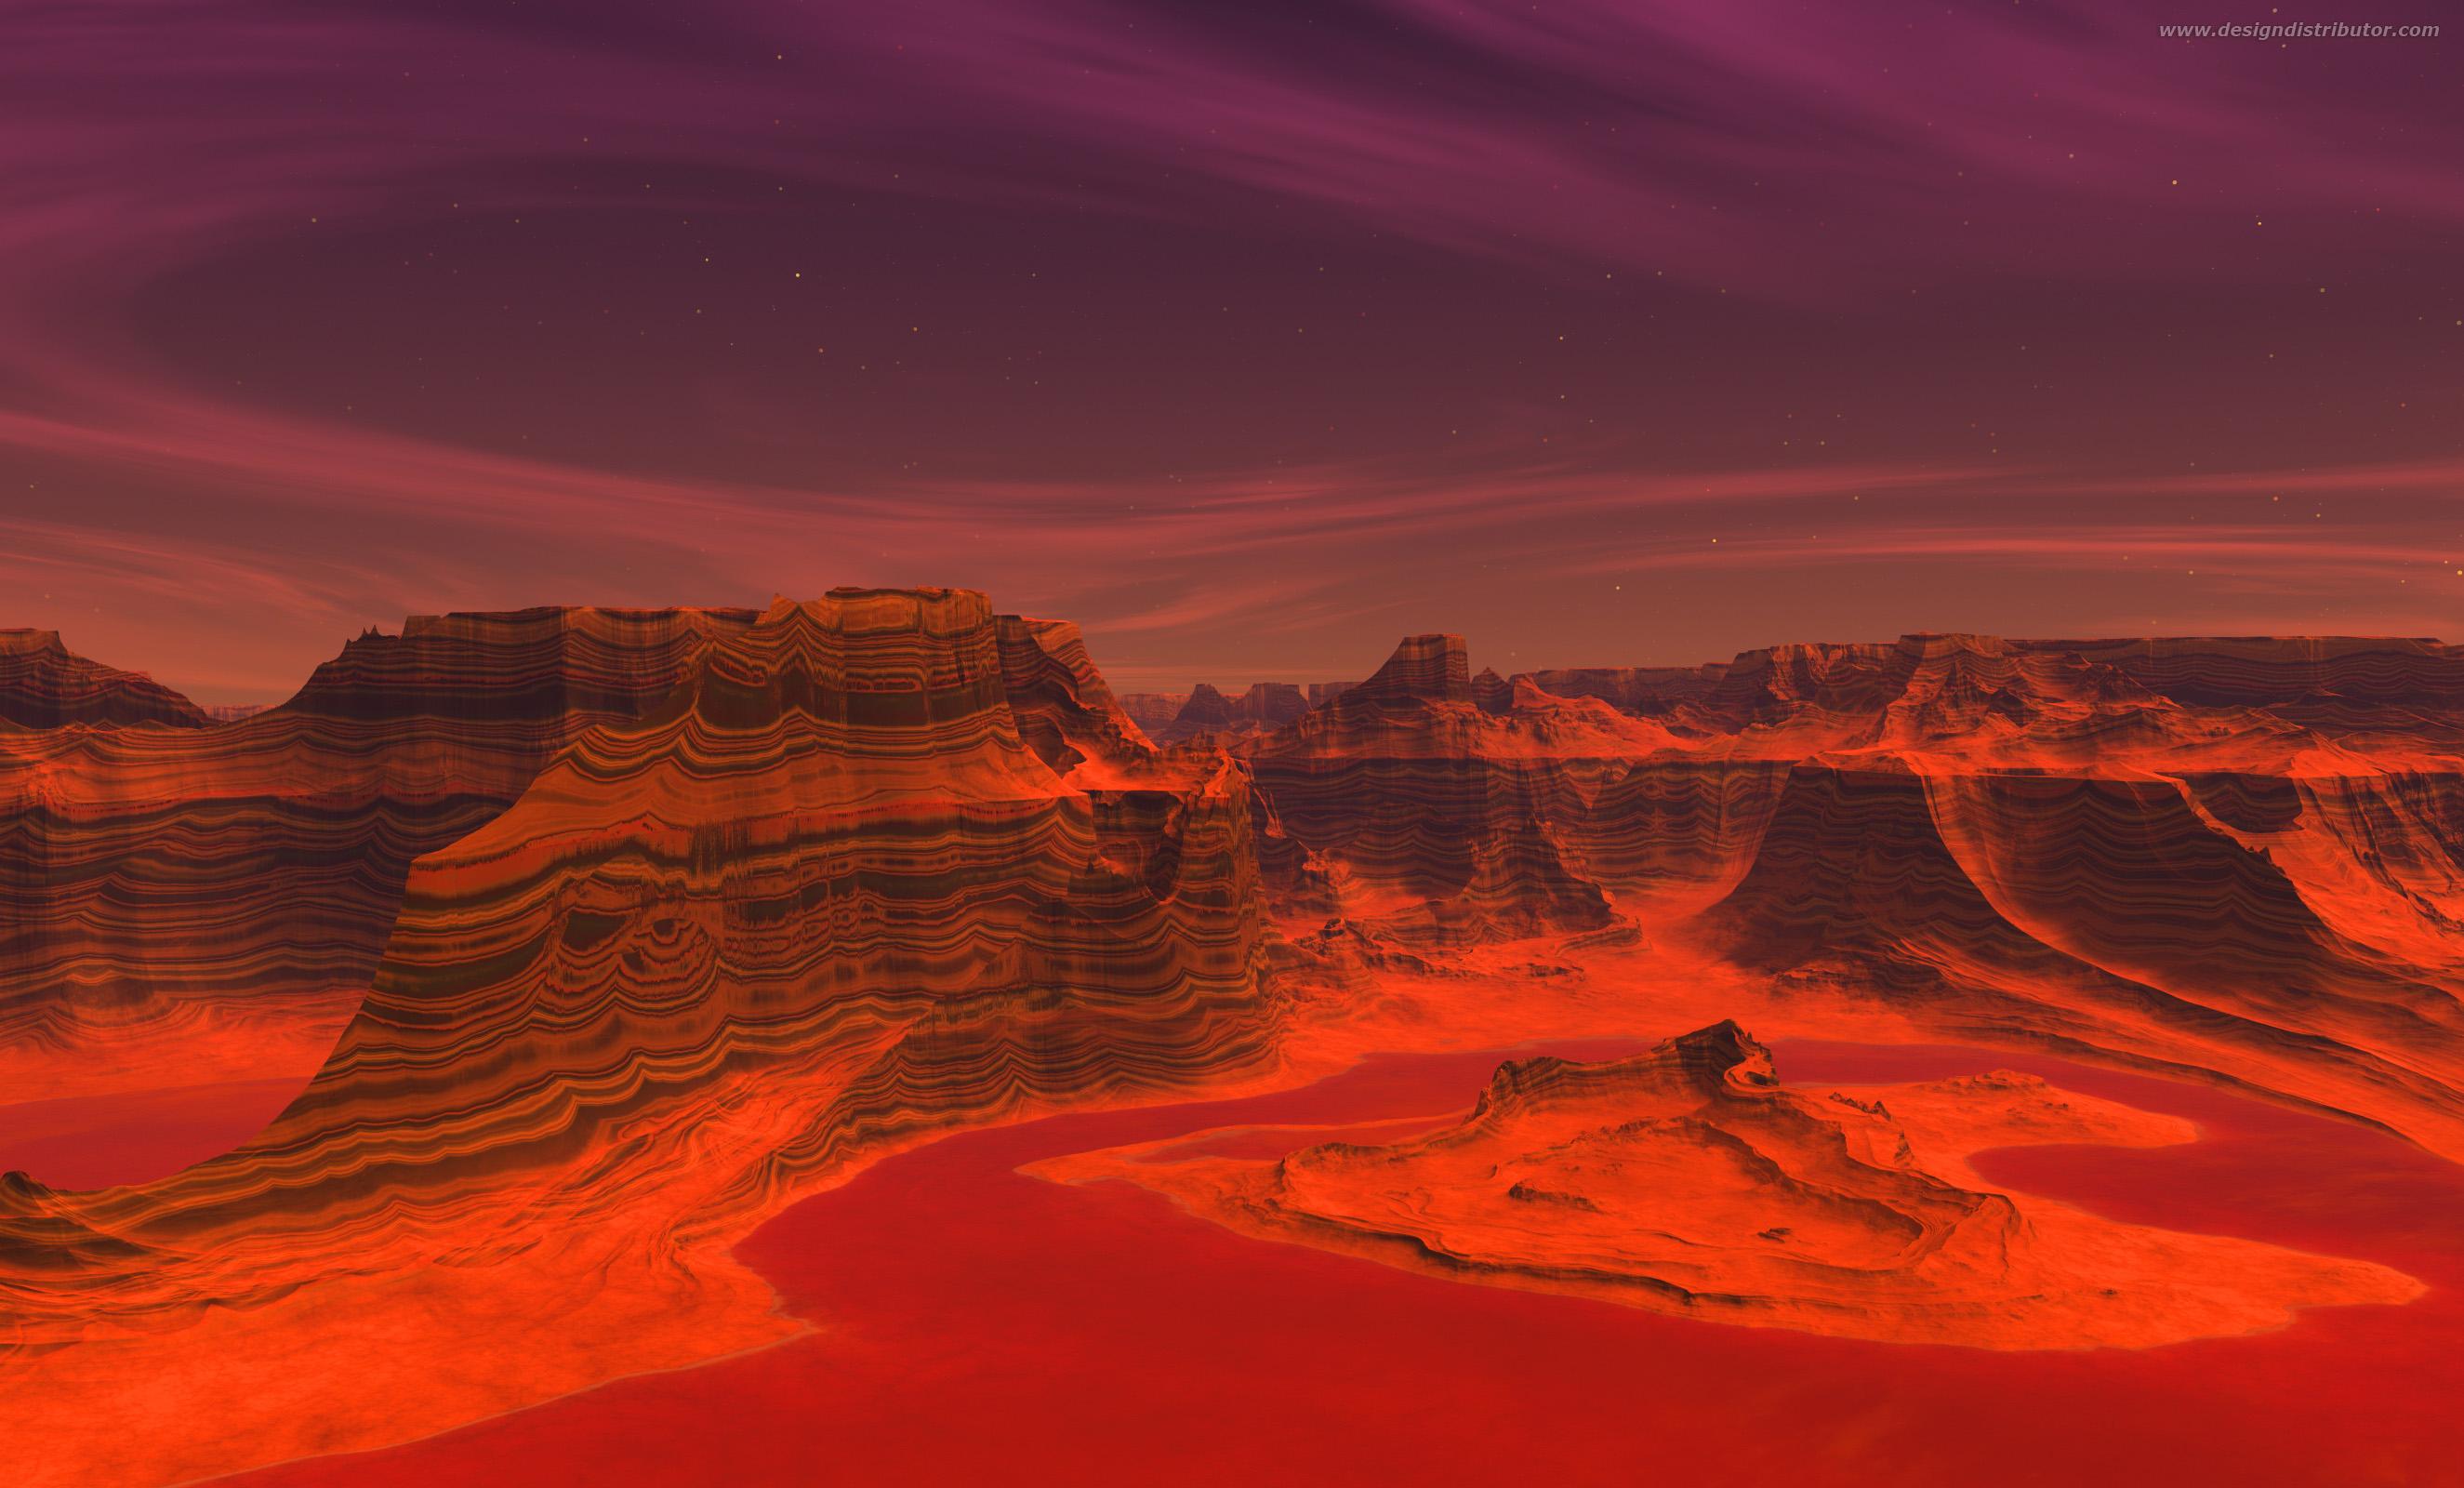 mars landscape images - HD2650×1600